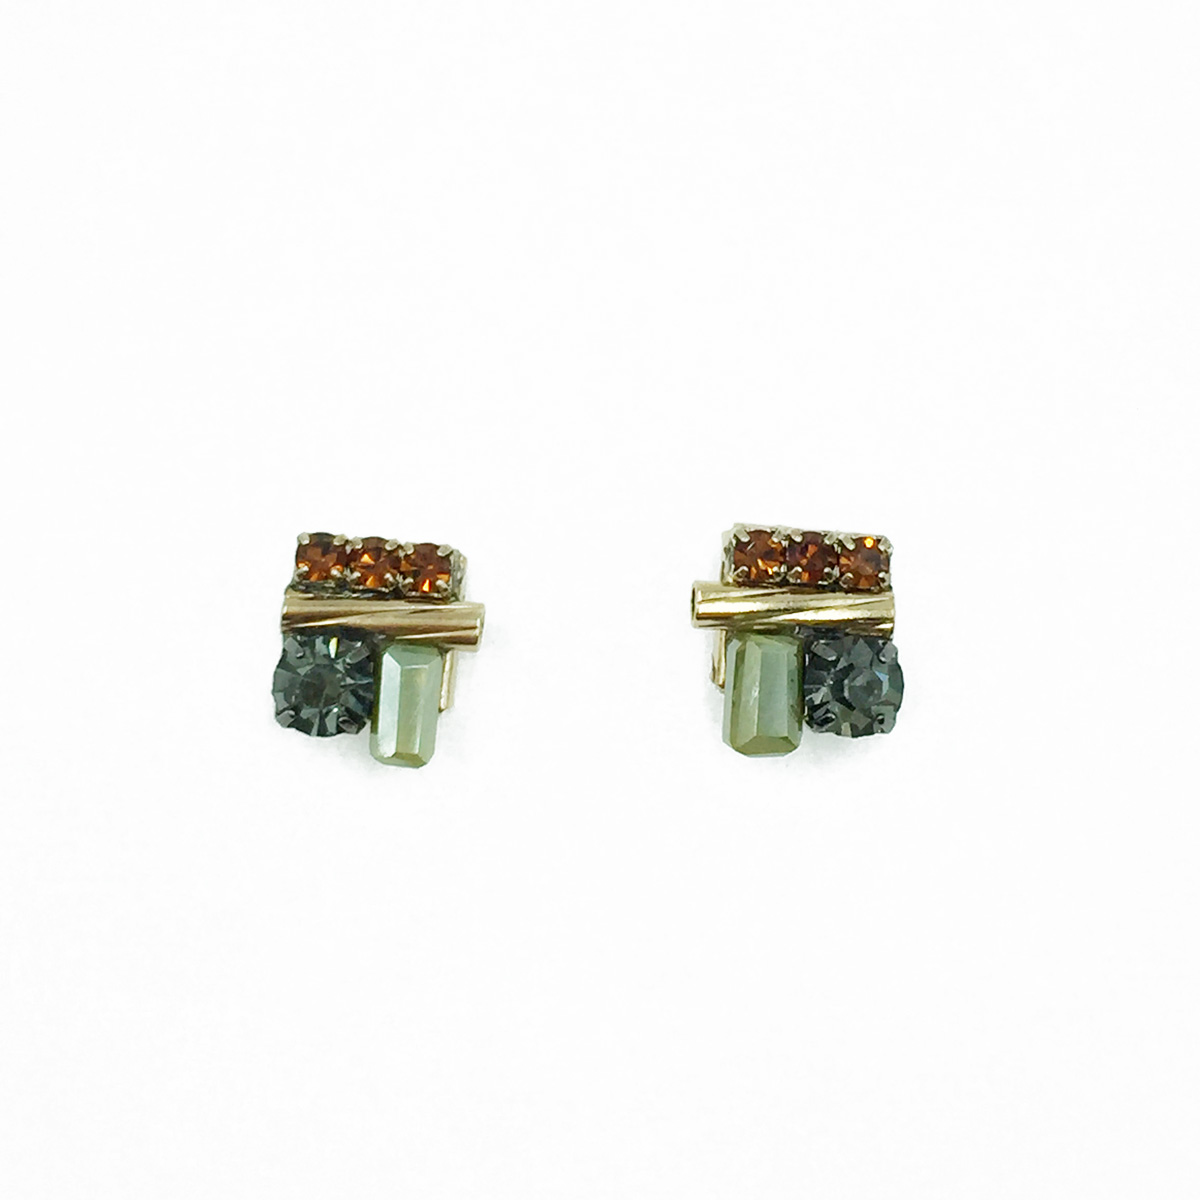 水鑽 精緻質感 耳針式耳環 採用施華洛世奇水晶元素 Crystals from Swarovski